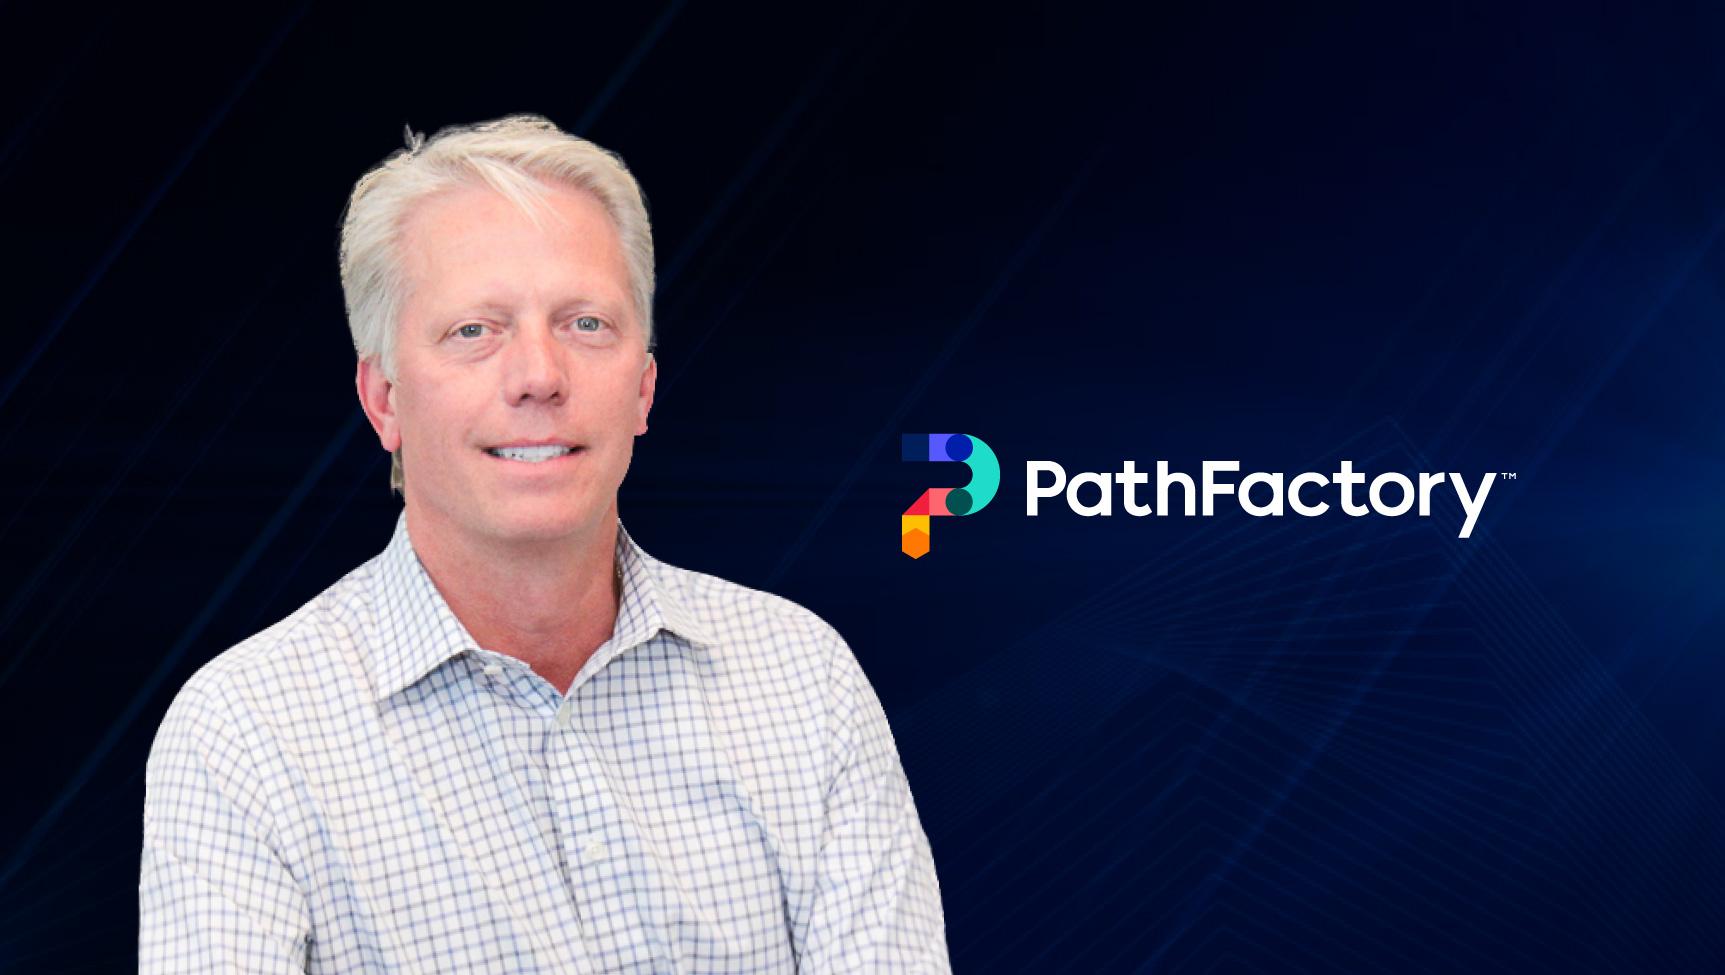 SalesTech Interview with Philip Kaszuba, SVP of Global Sales at PathFactory